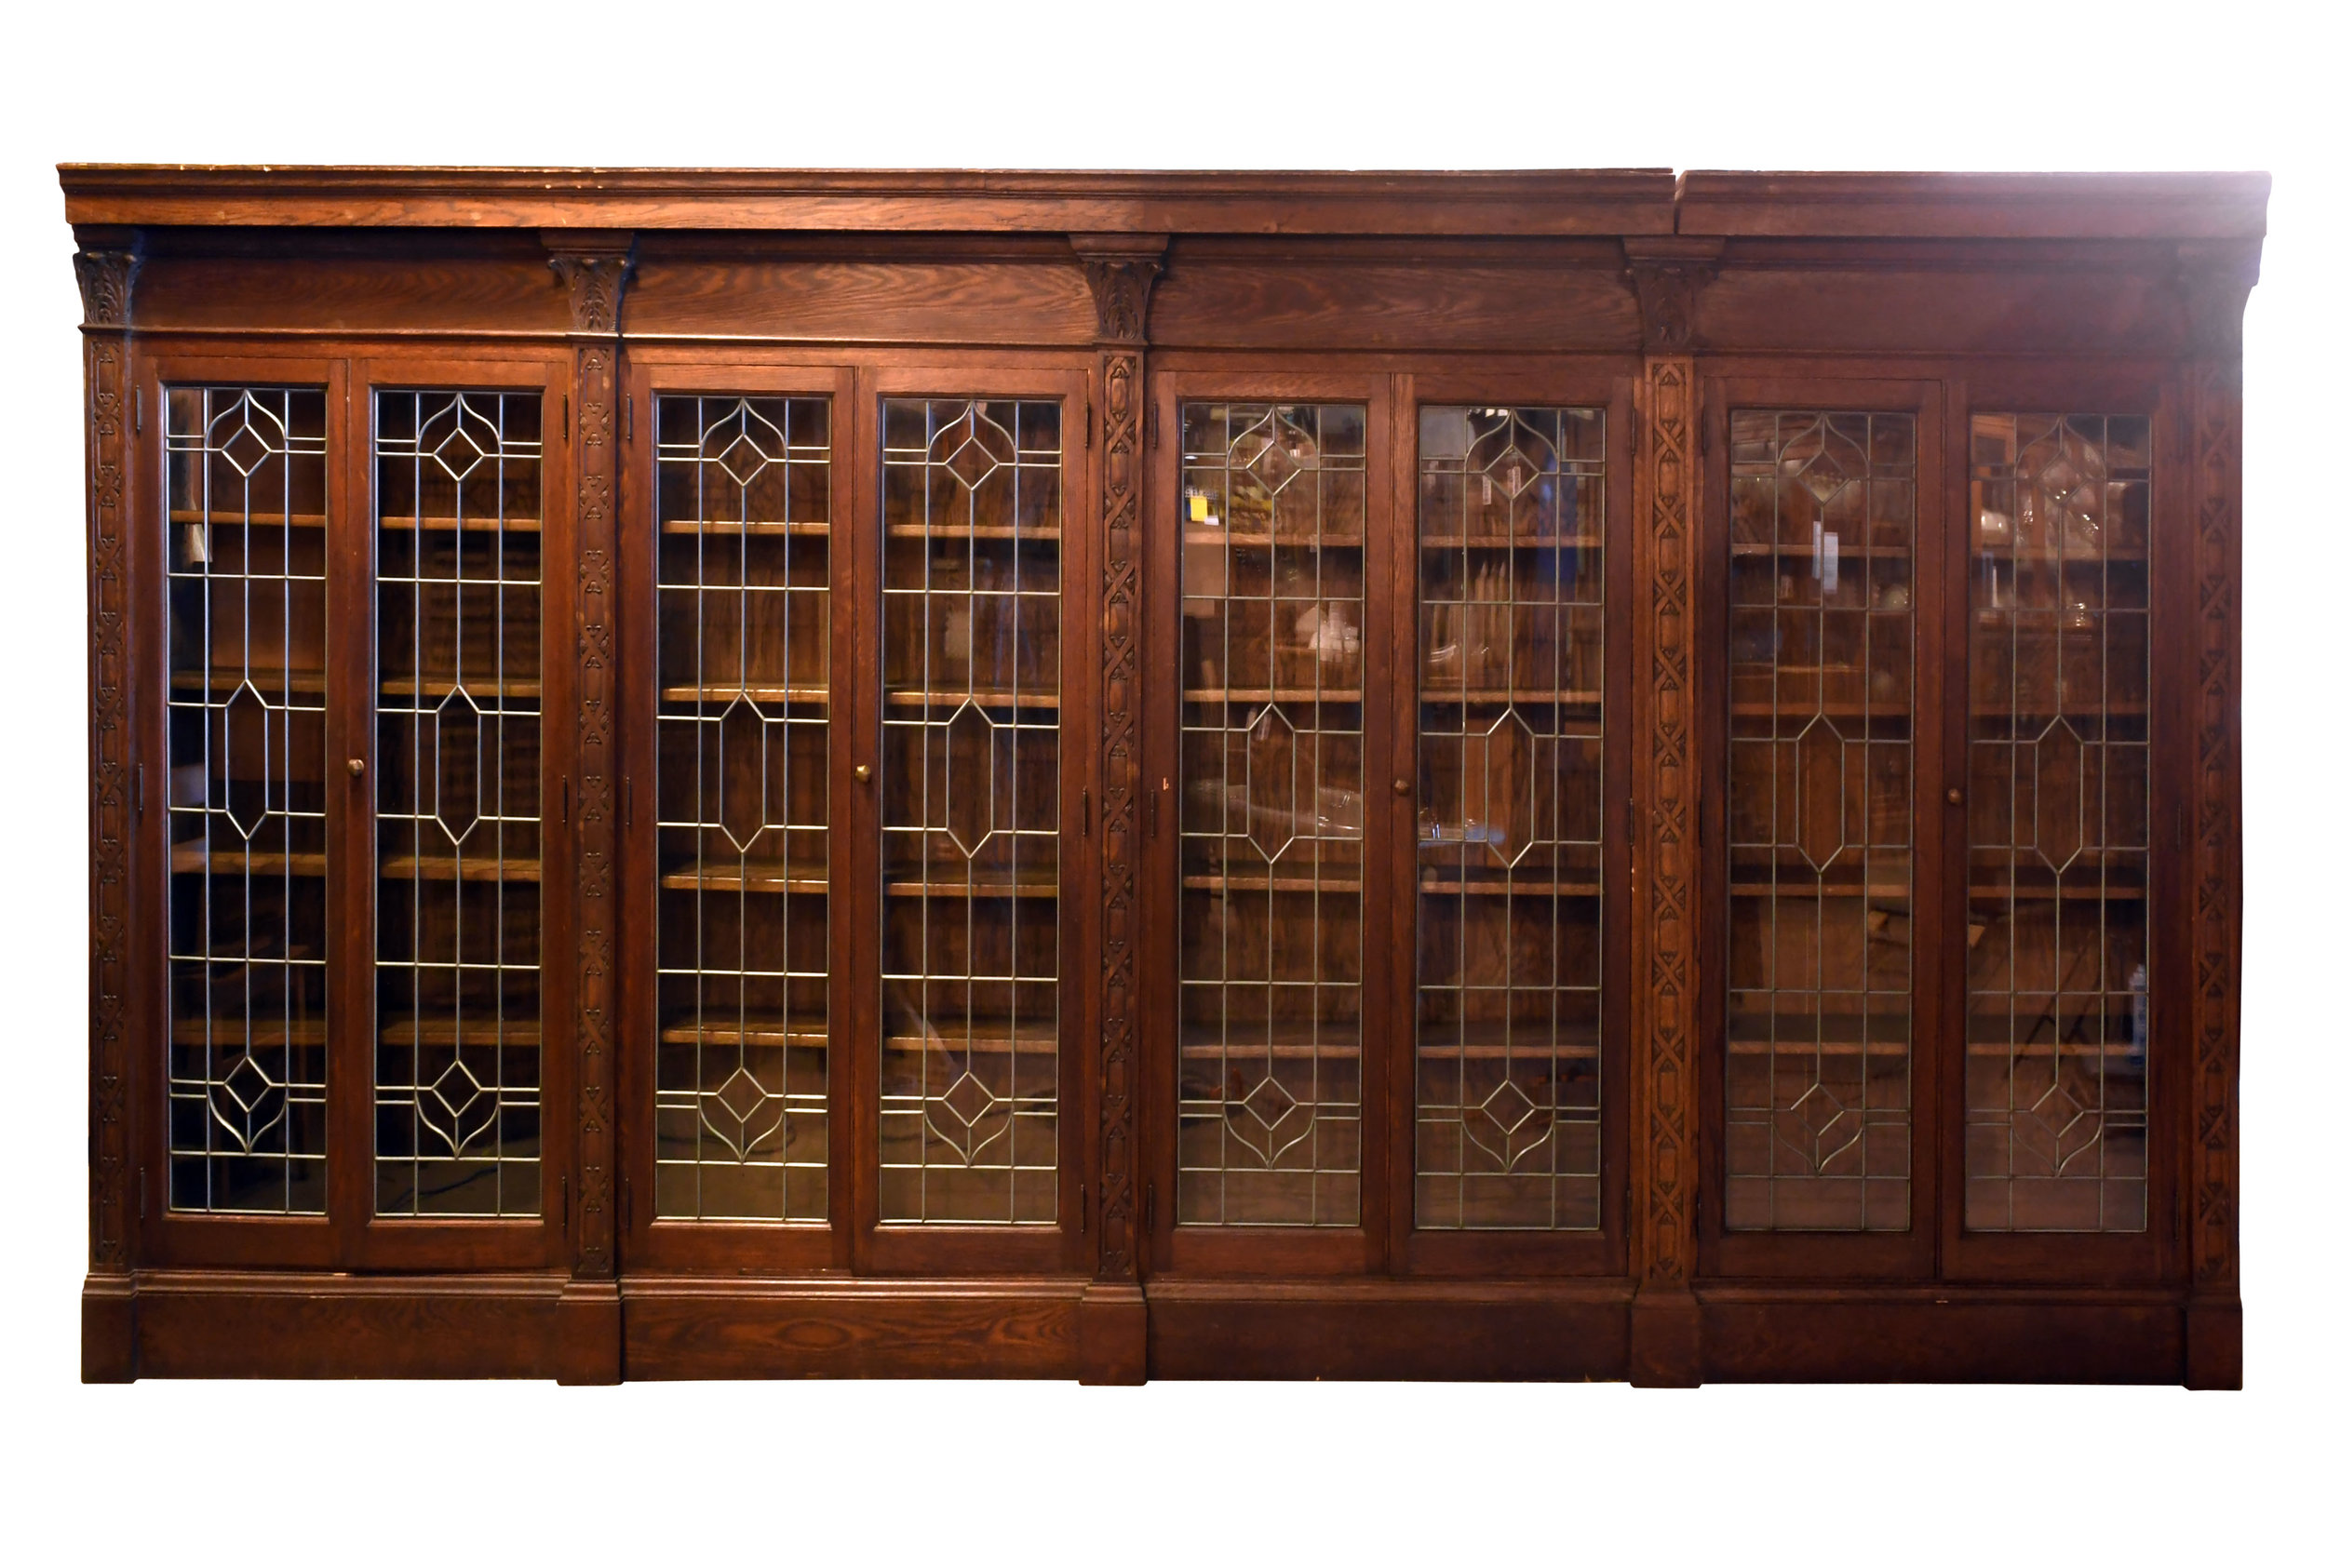 47334-large-bookcase-unit-front-view.jpg